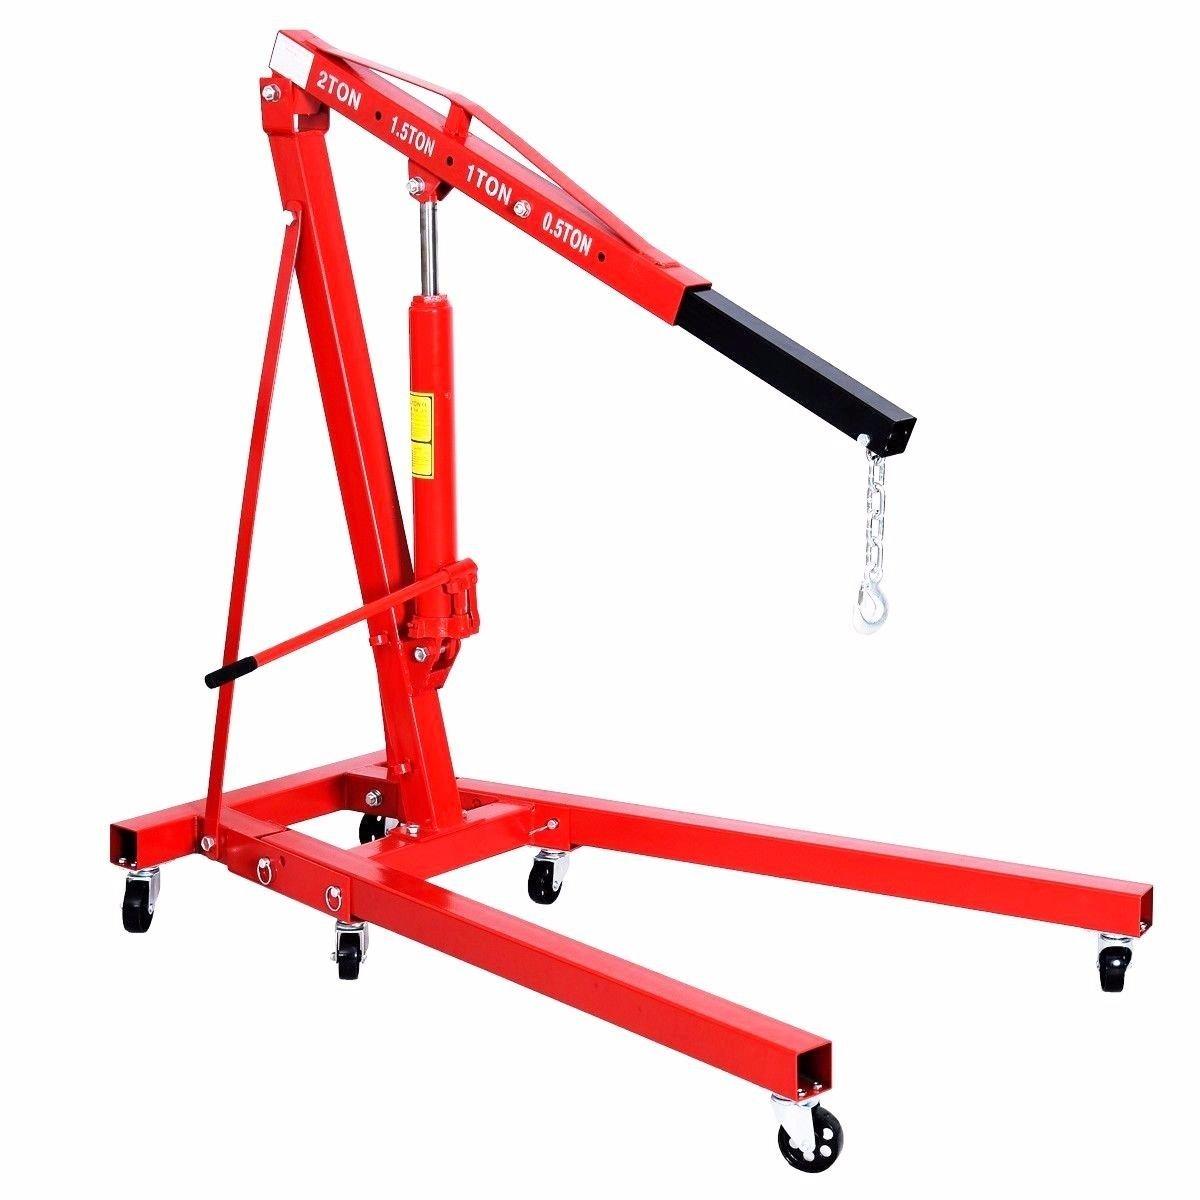 2 Ton Red Color 4000 Lb Engine Motor Hoist Cherry Picker Shop Crane Lift New